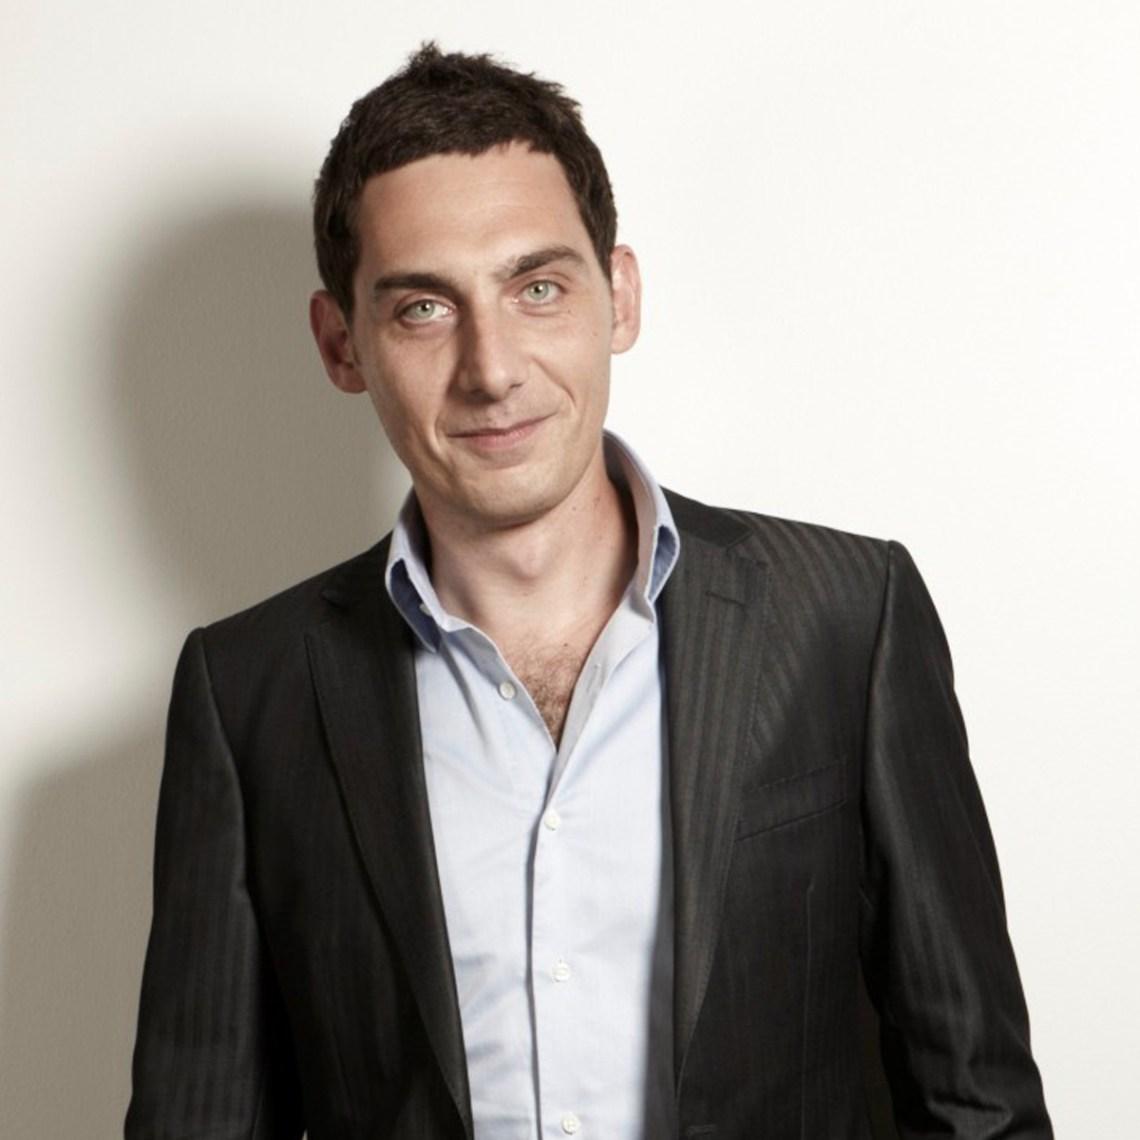 Joachim Maresma est un eXpert de GCX Conseil